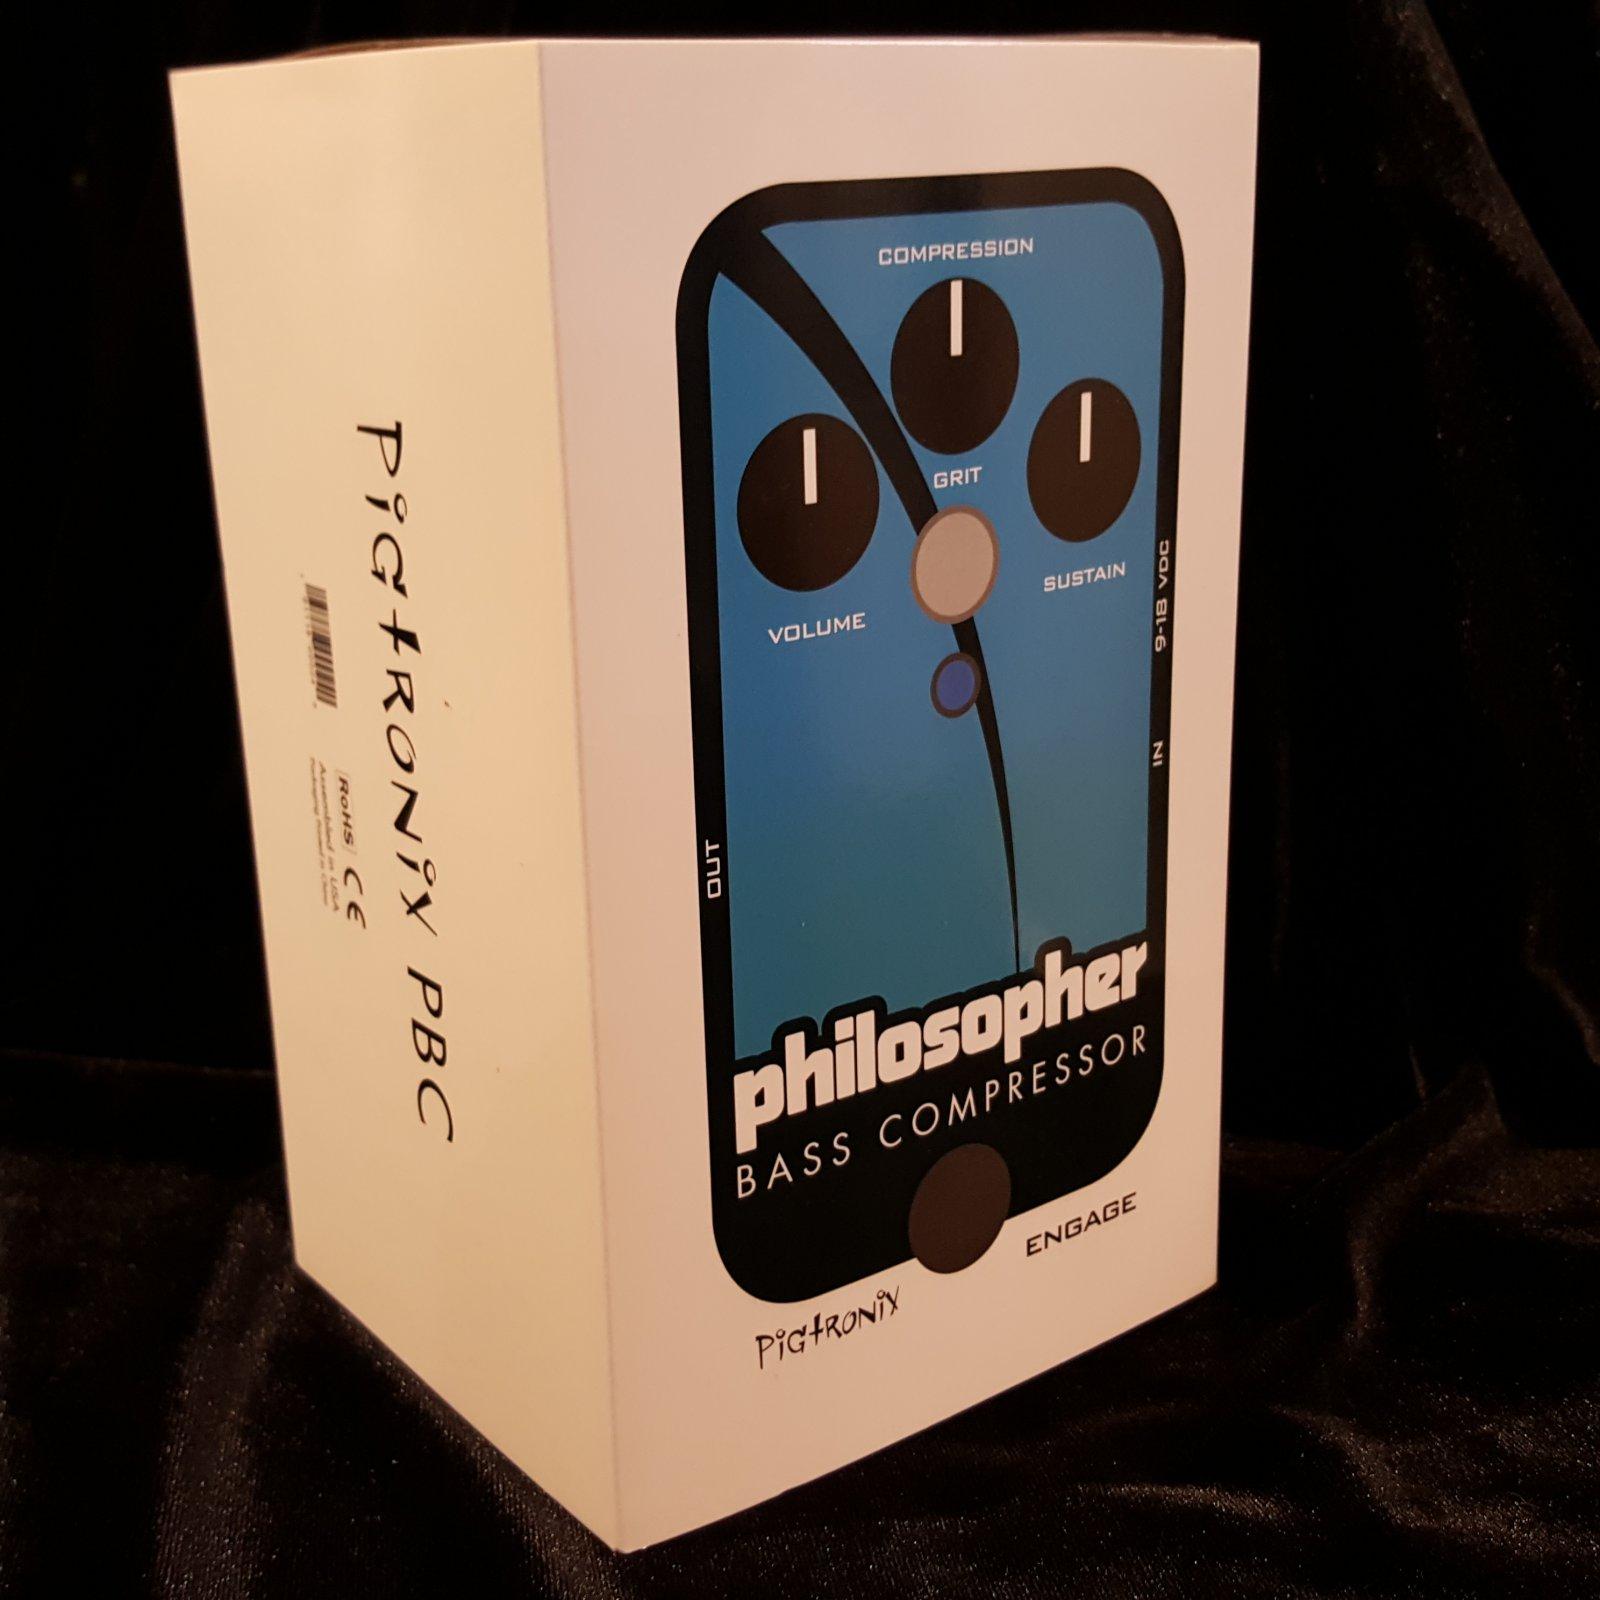 Pigtronix Philosopher Bass Compressor Pedal